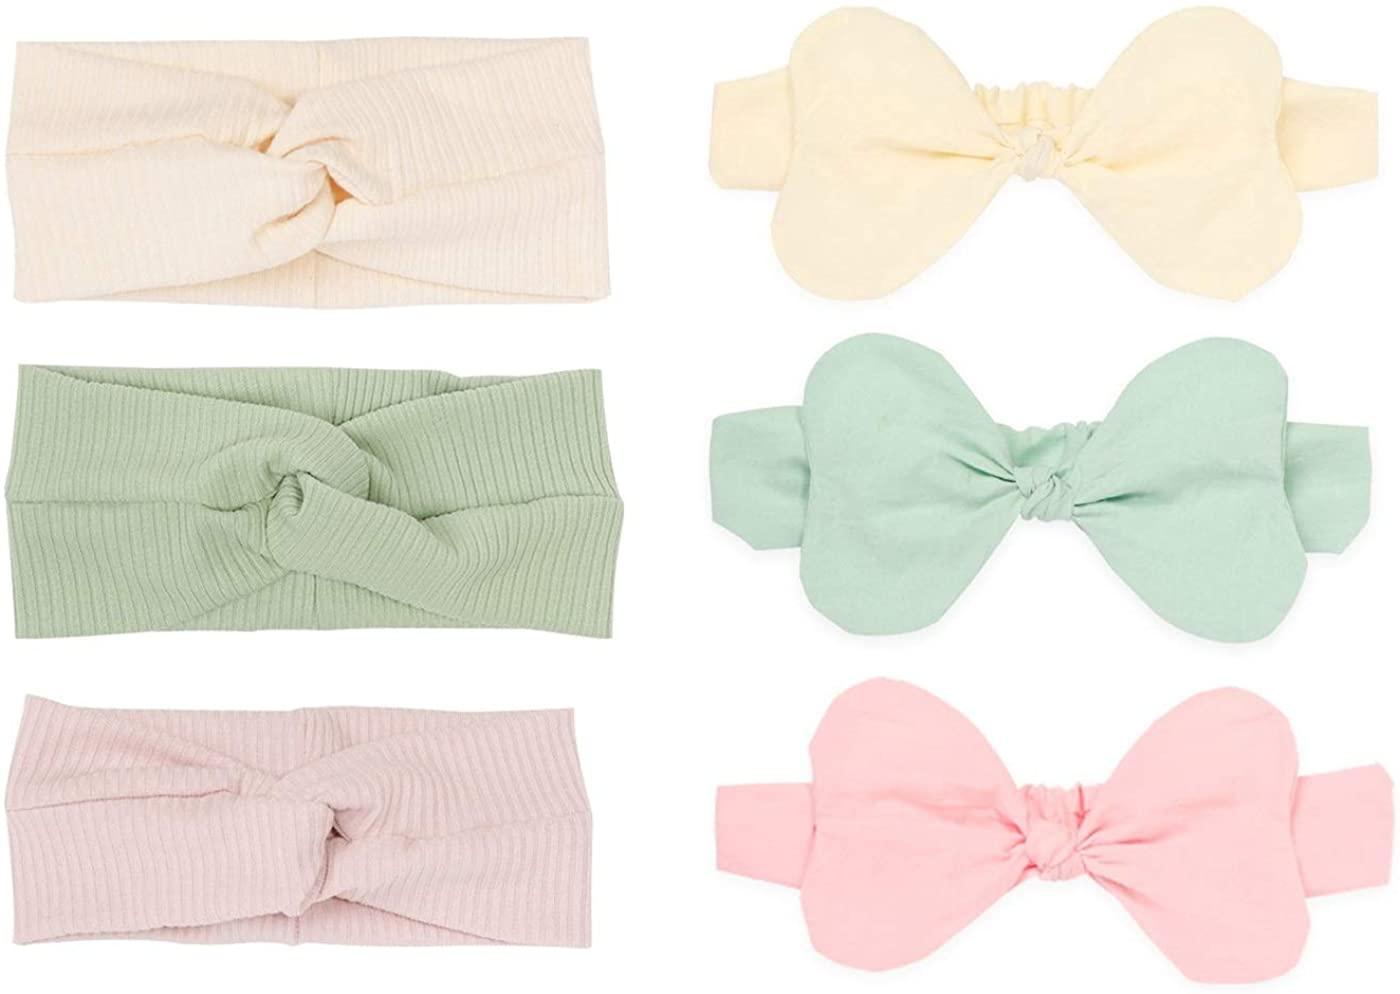 6Pcs All-cotton Baby Girls Headbands Set, 3Pcs Criss Cross Headbands and 3Pcs Big Bowknot Headbands for Newborns Infants Toddlers